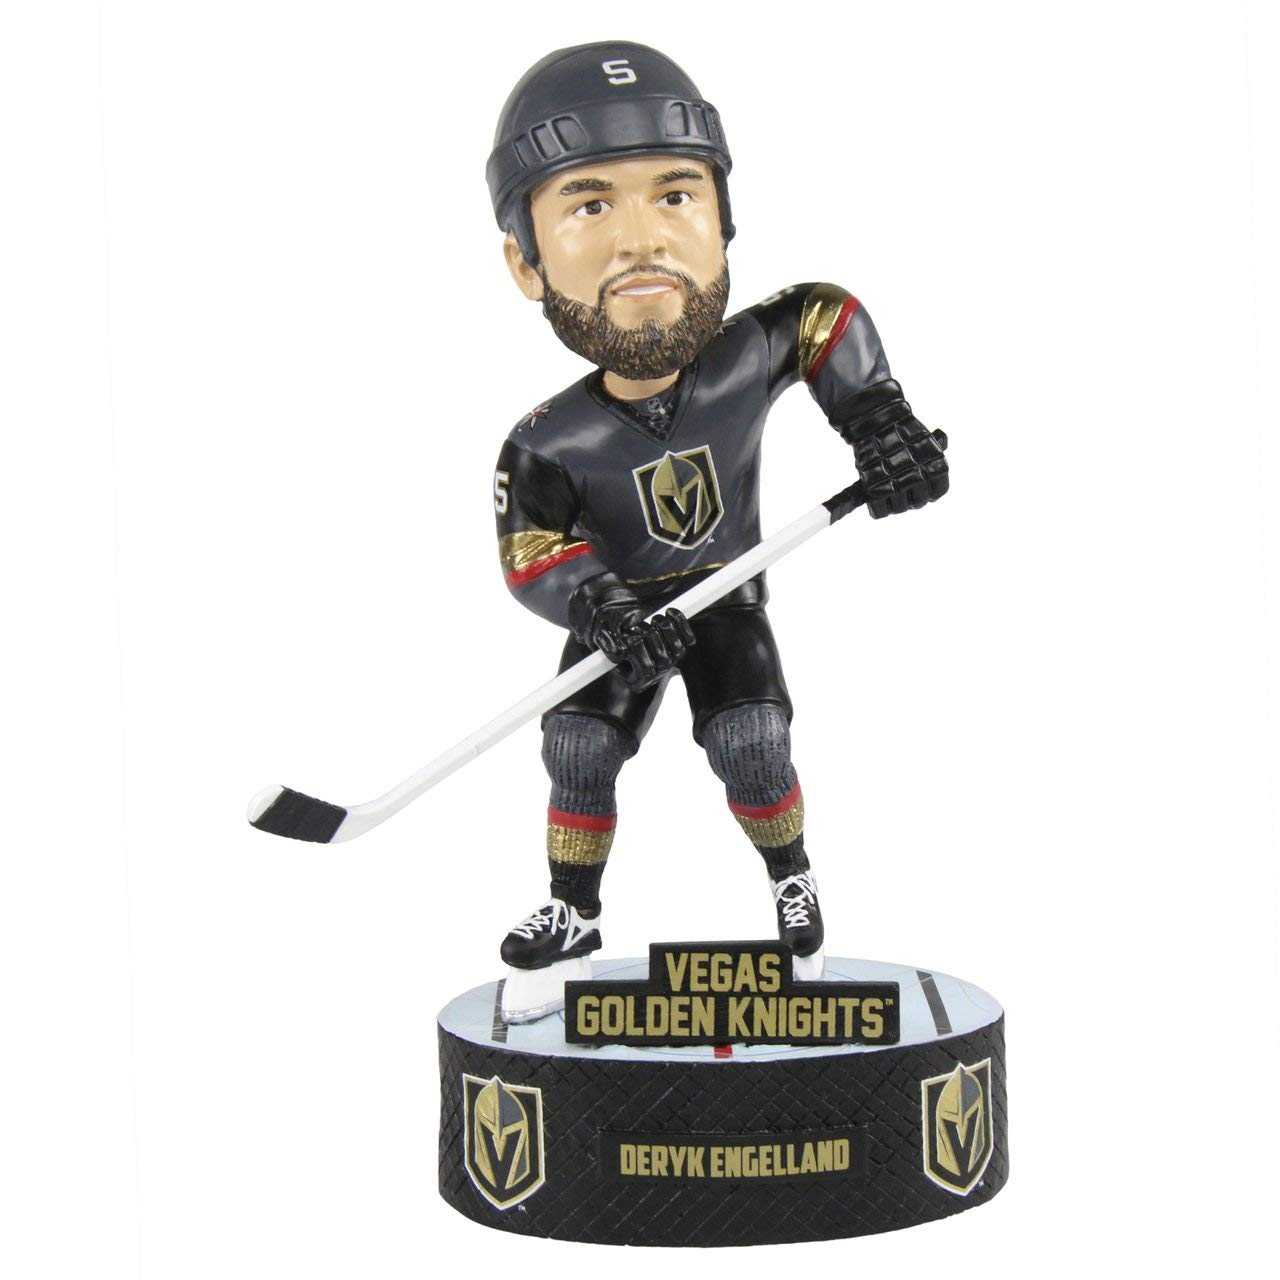 Forever Collectibles Deryk Engelland Las Vegas Golden Knights Baller Special Edition Bobblehead NHL